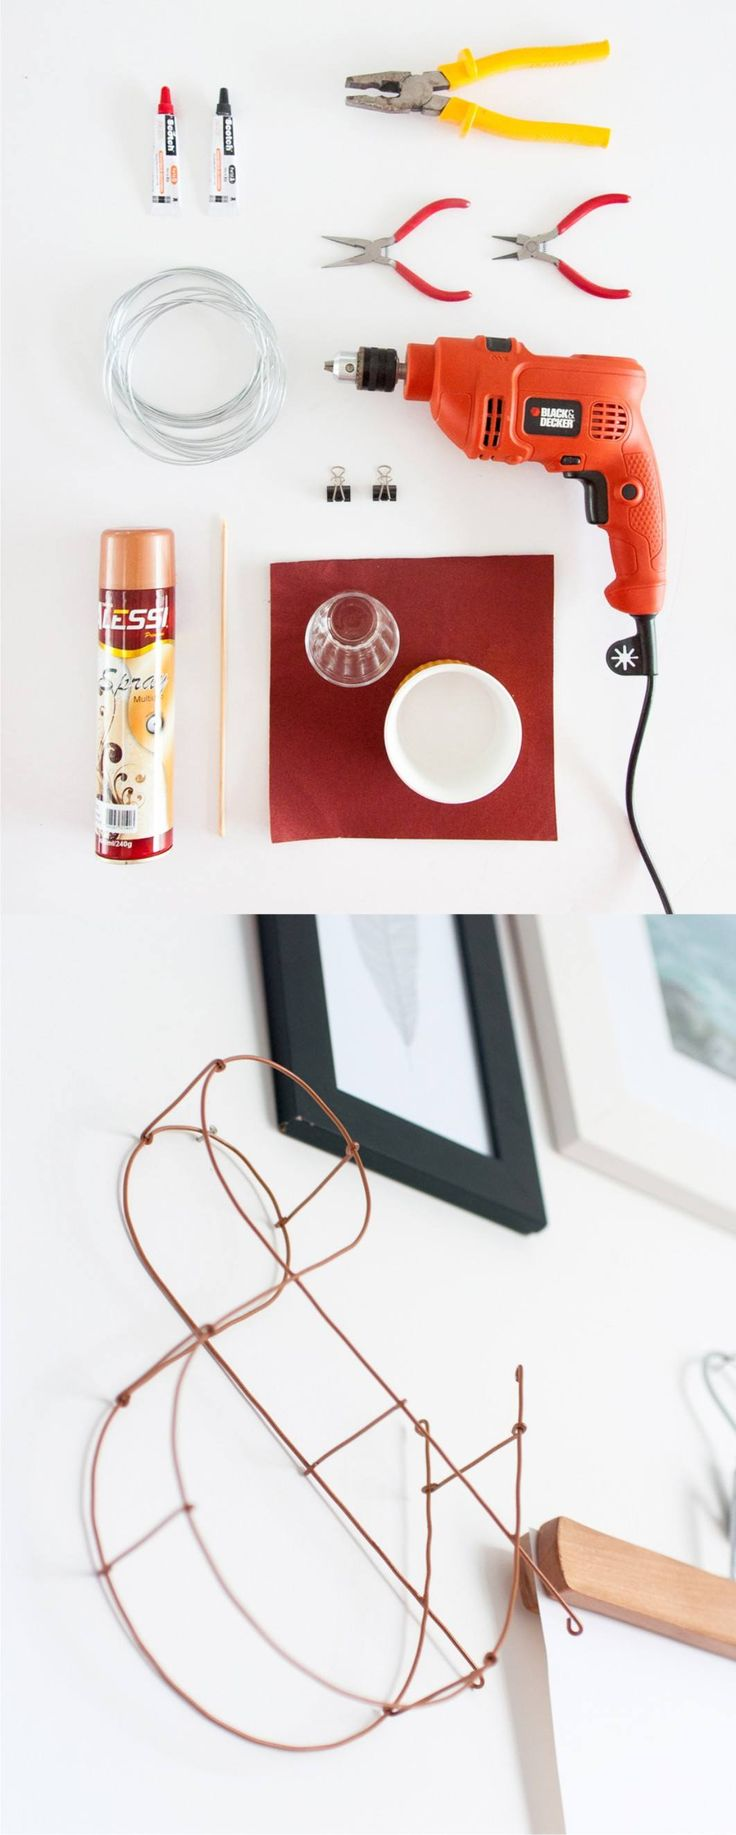 DIY Wire Letter Wall Decor - historiasdecasa.com.br - Letra de pared con alambre